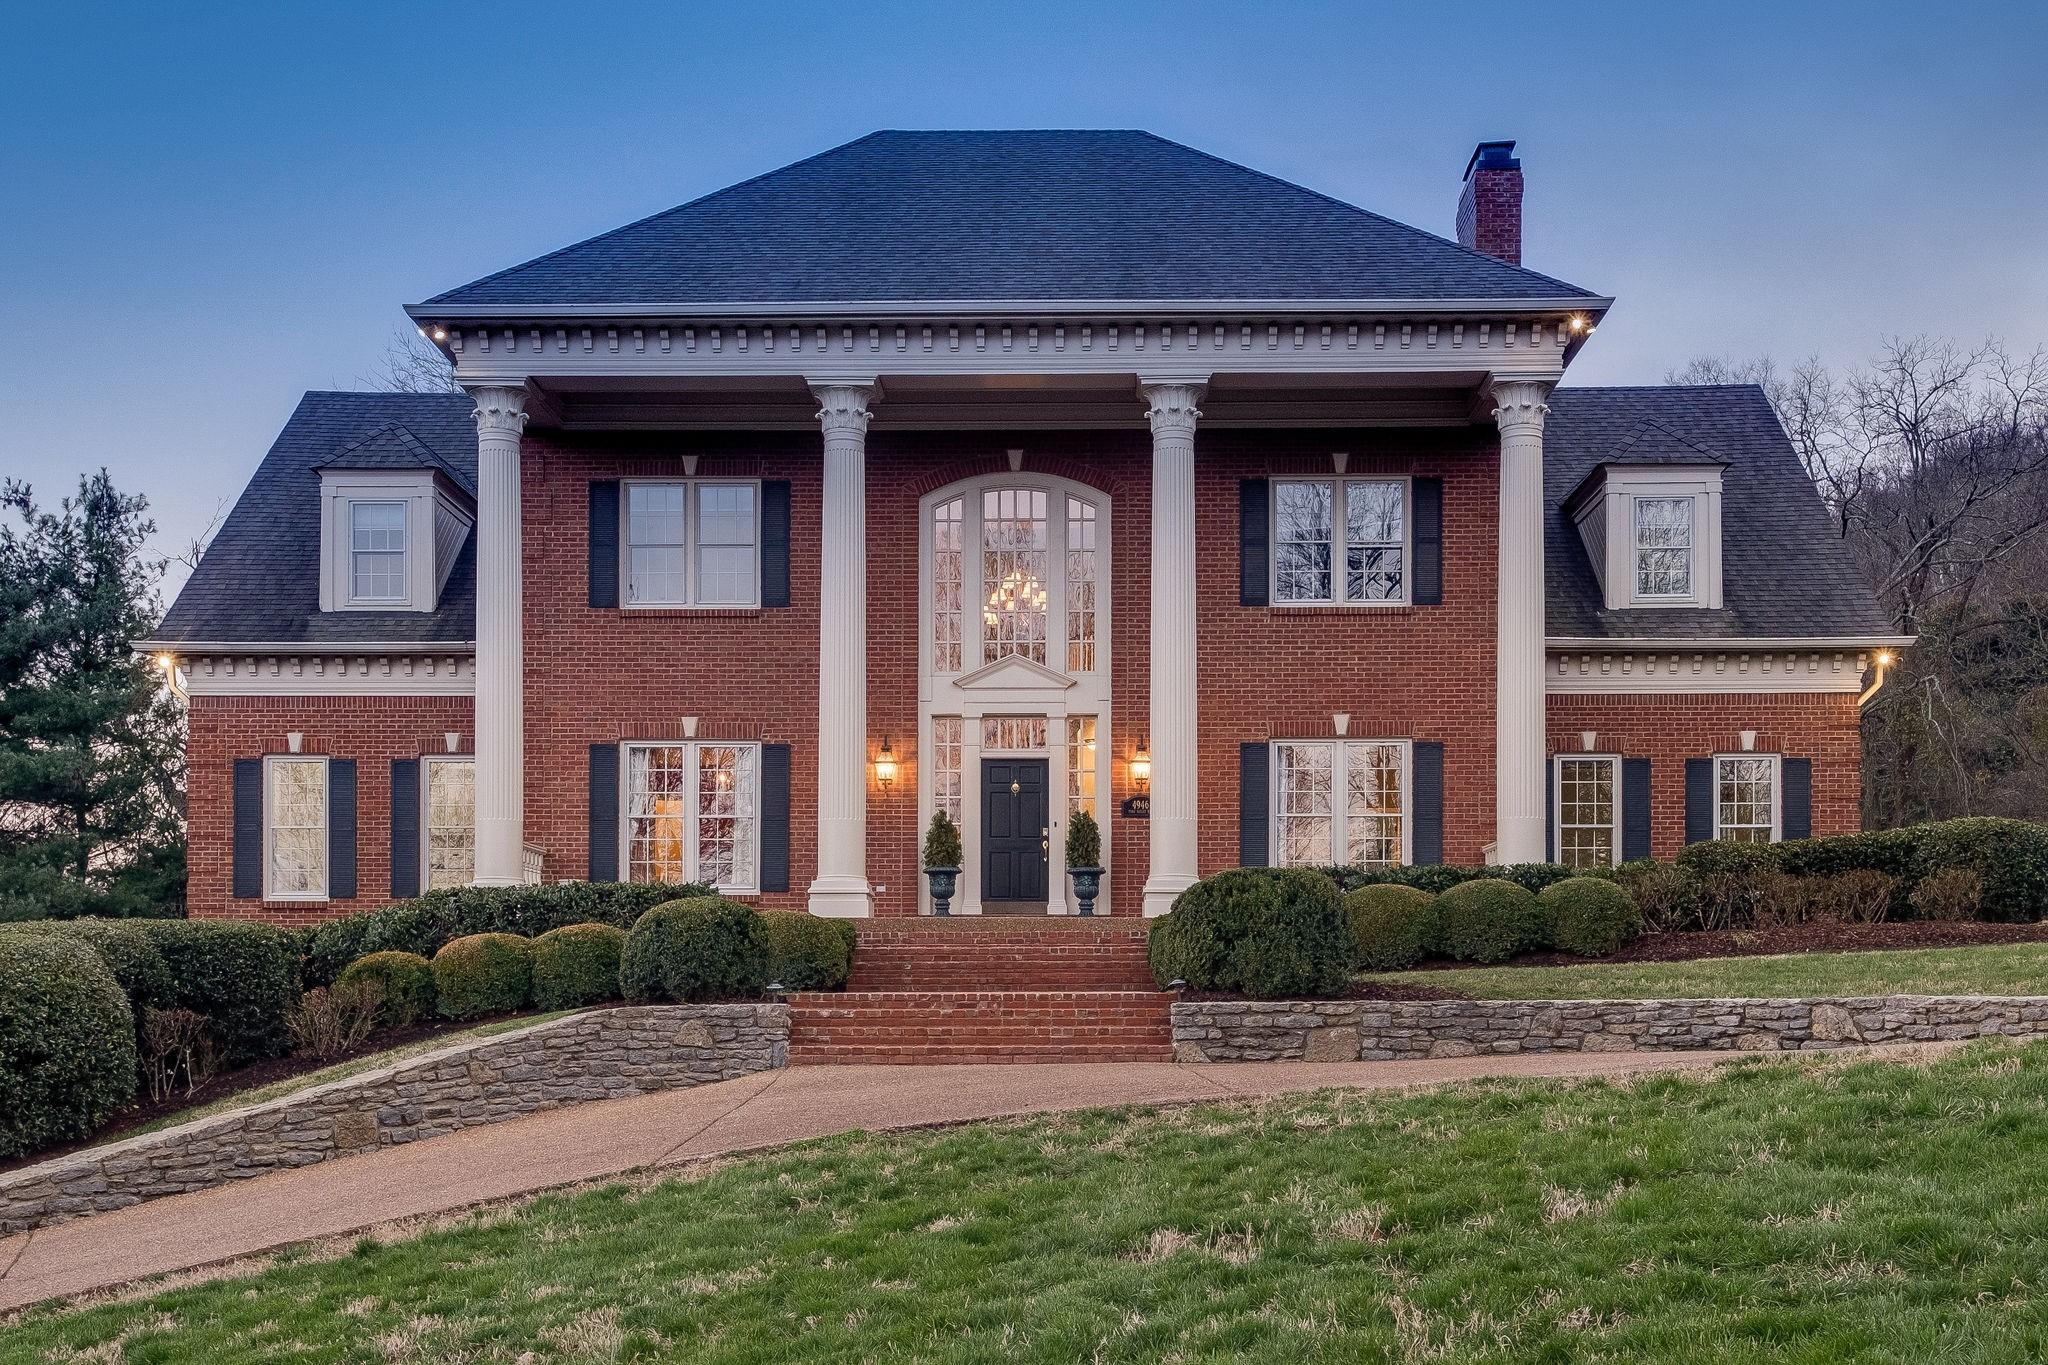 4946 Tyne Valley Blvd, Nashville, TN 37220 - Nashville, TN real estate listing